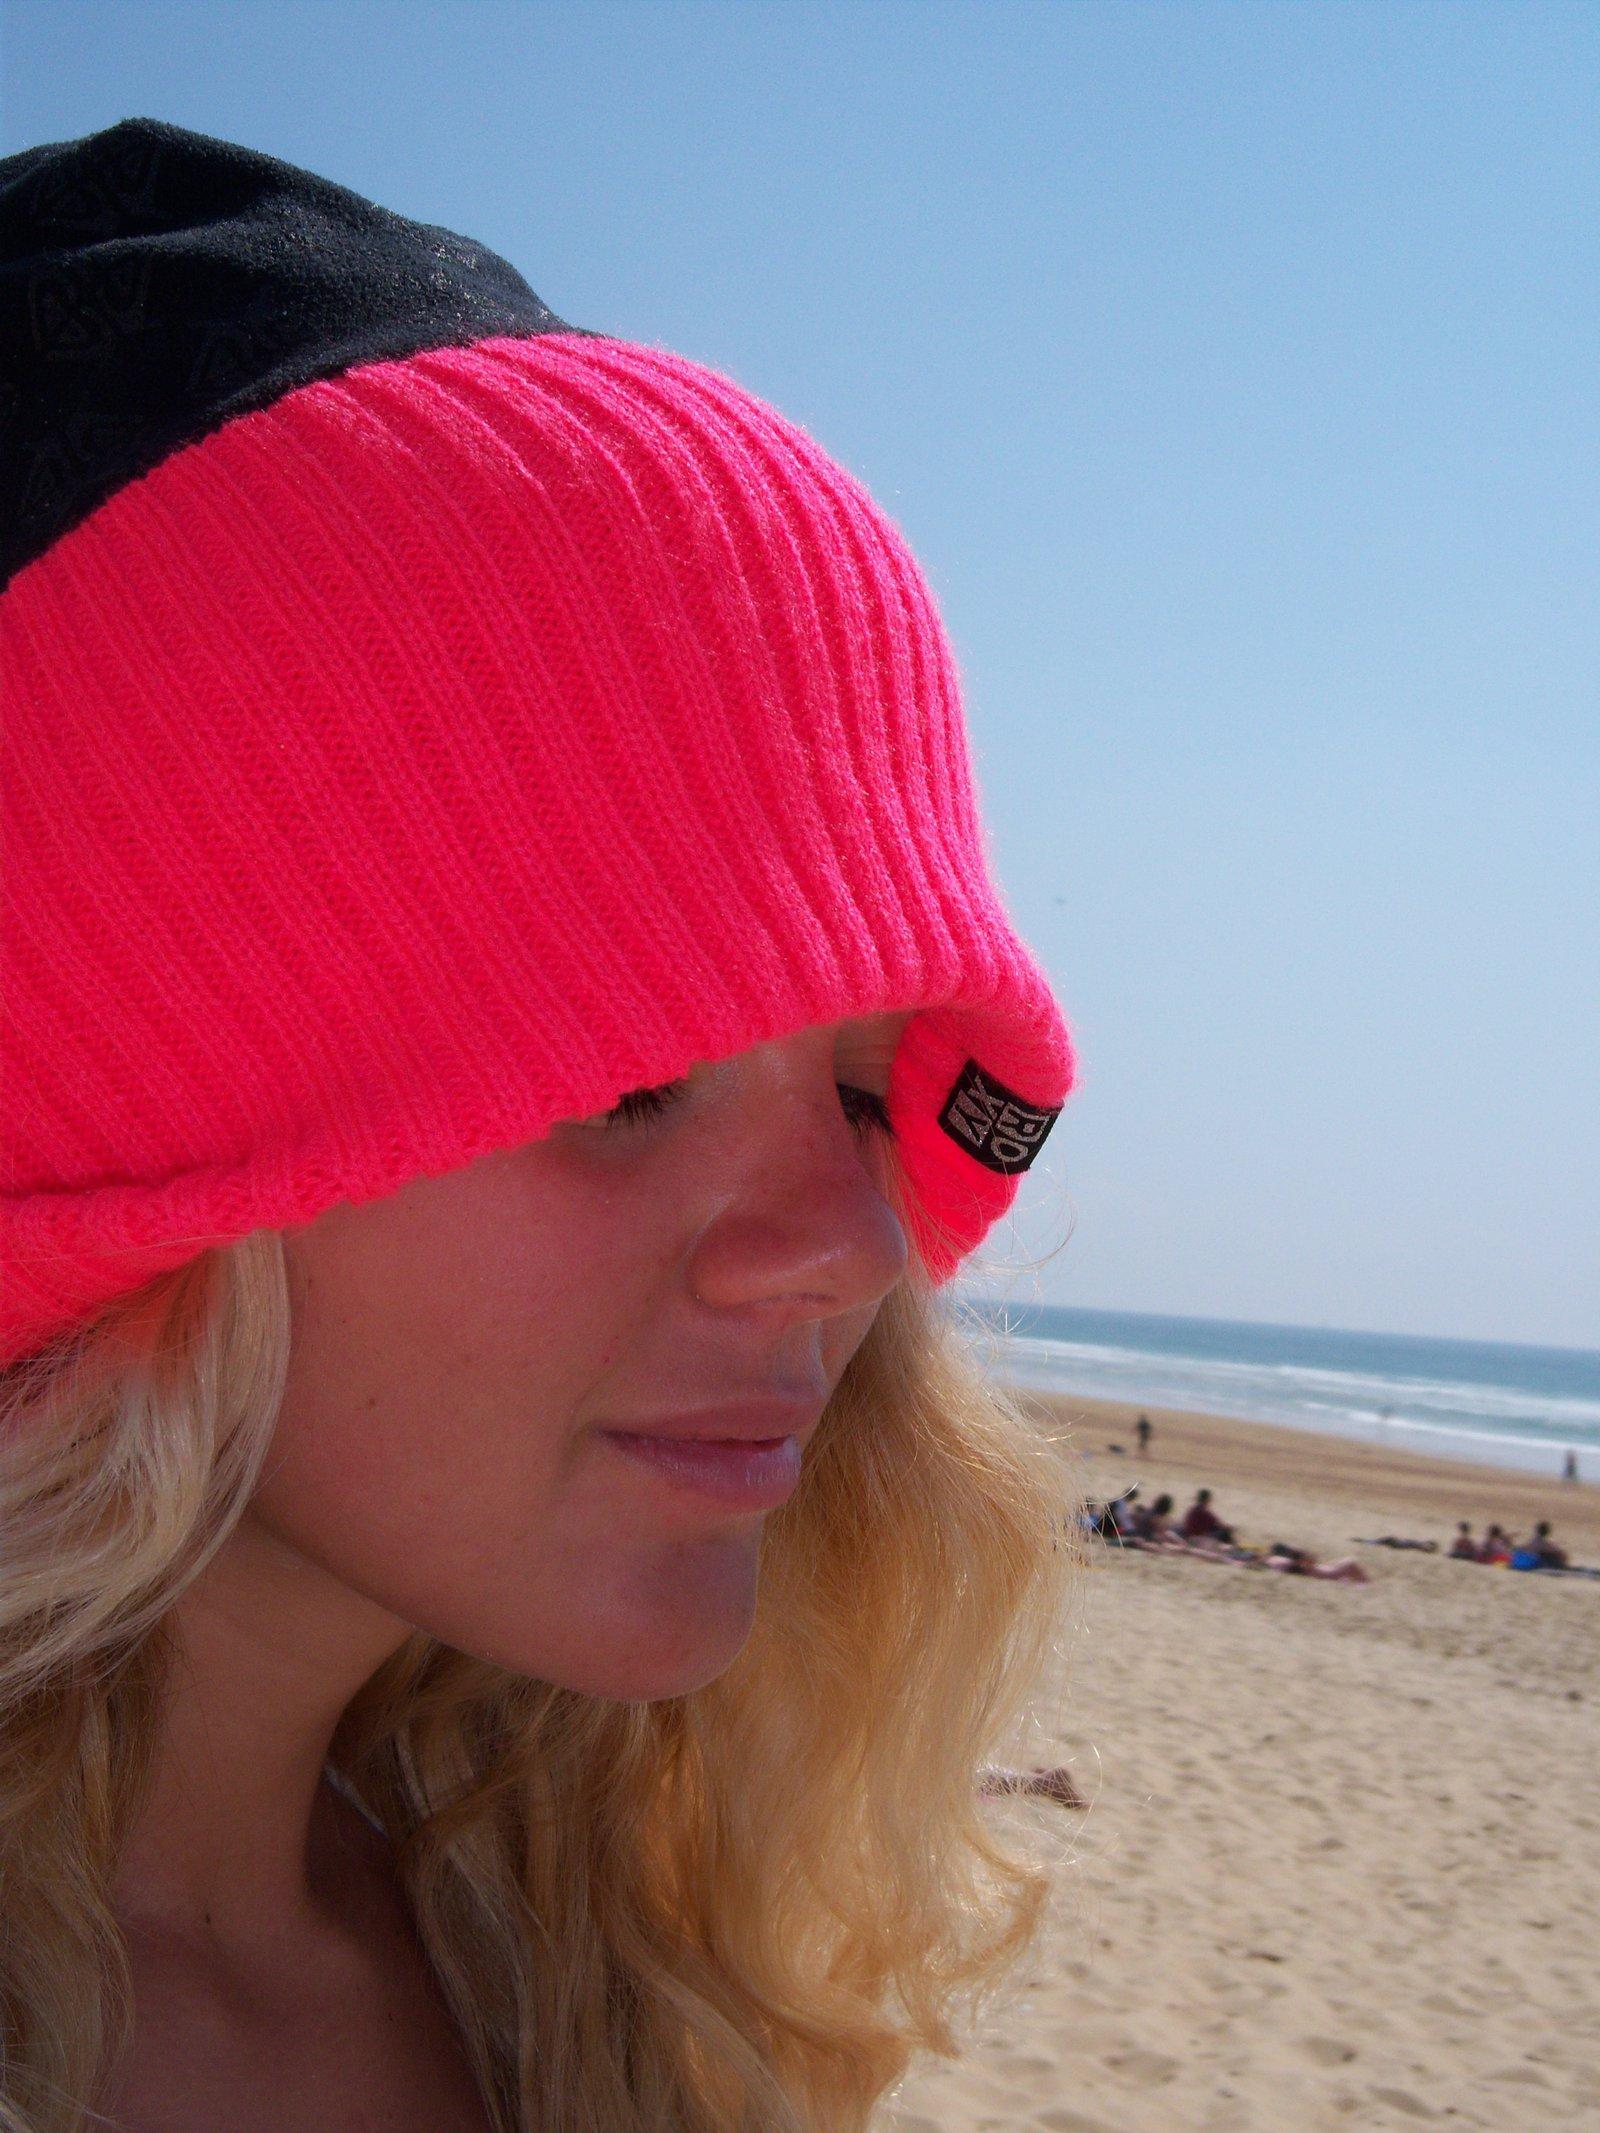 Summer n surf